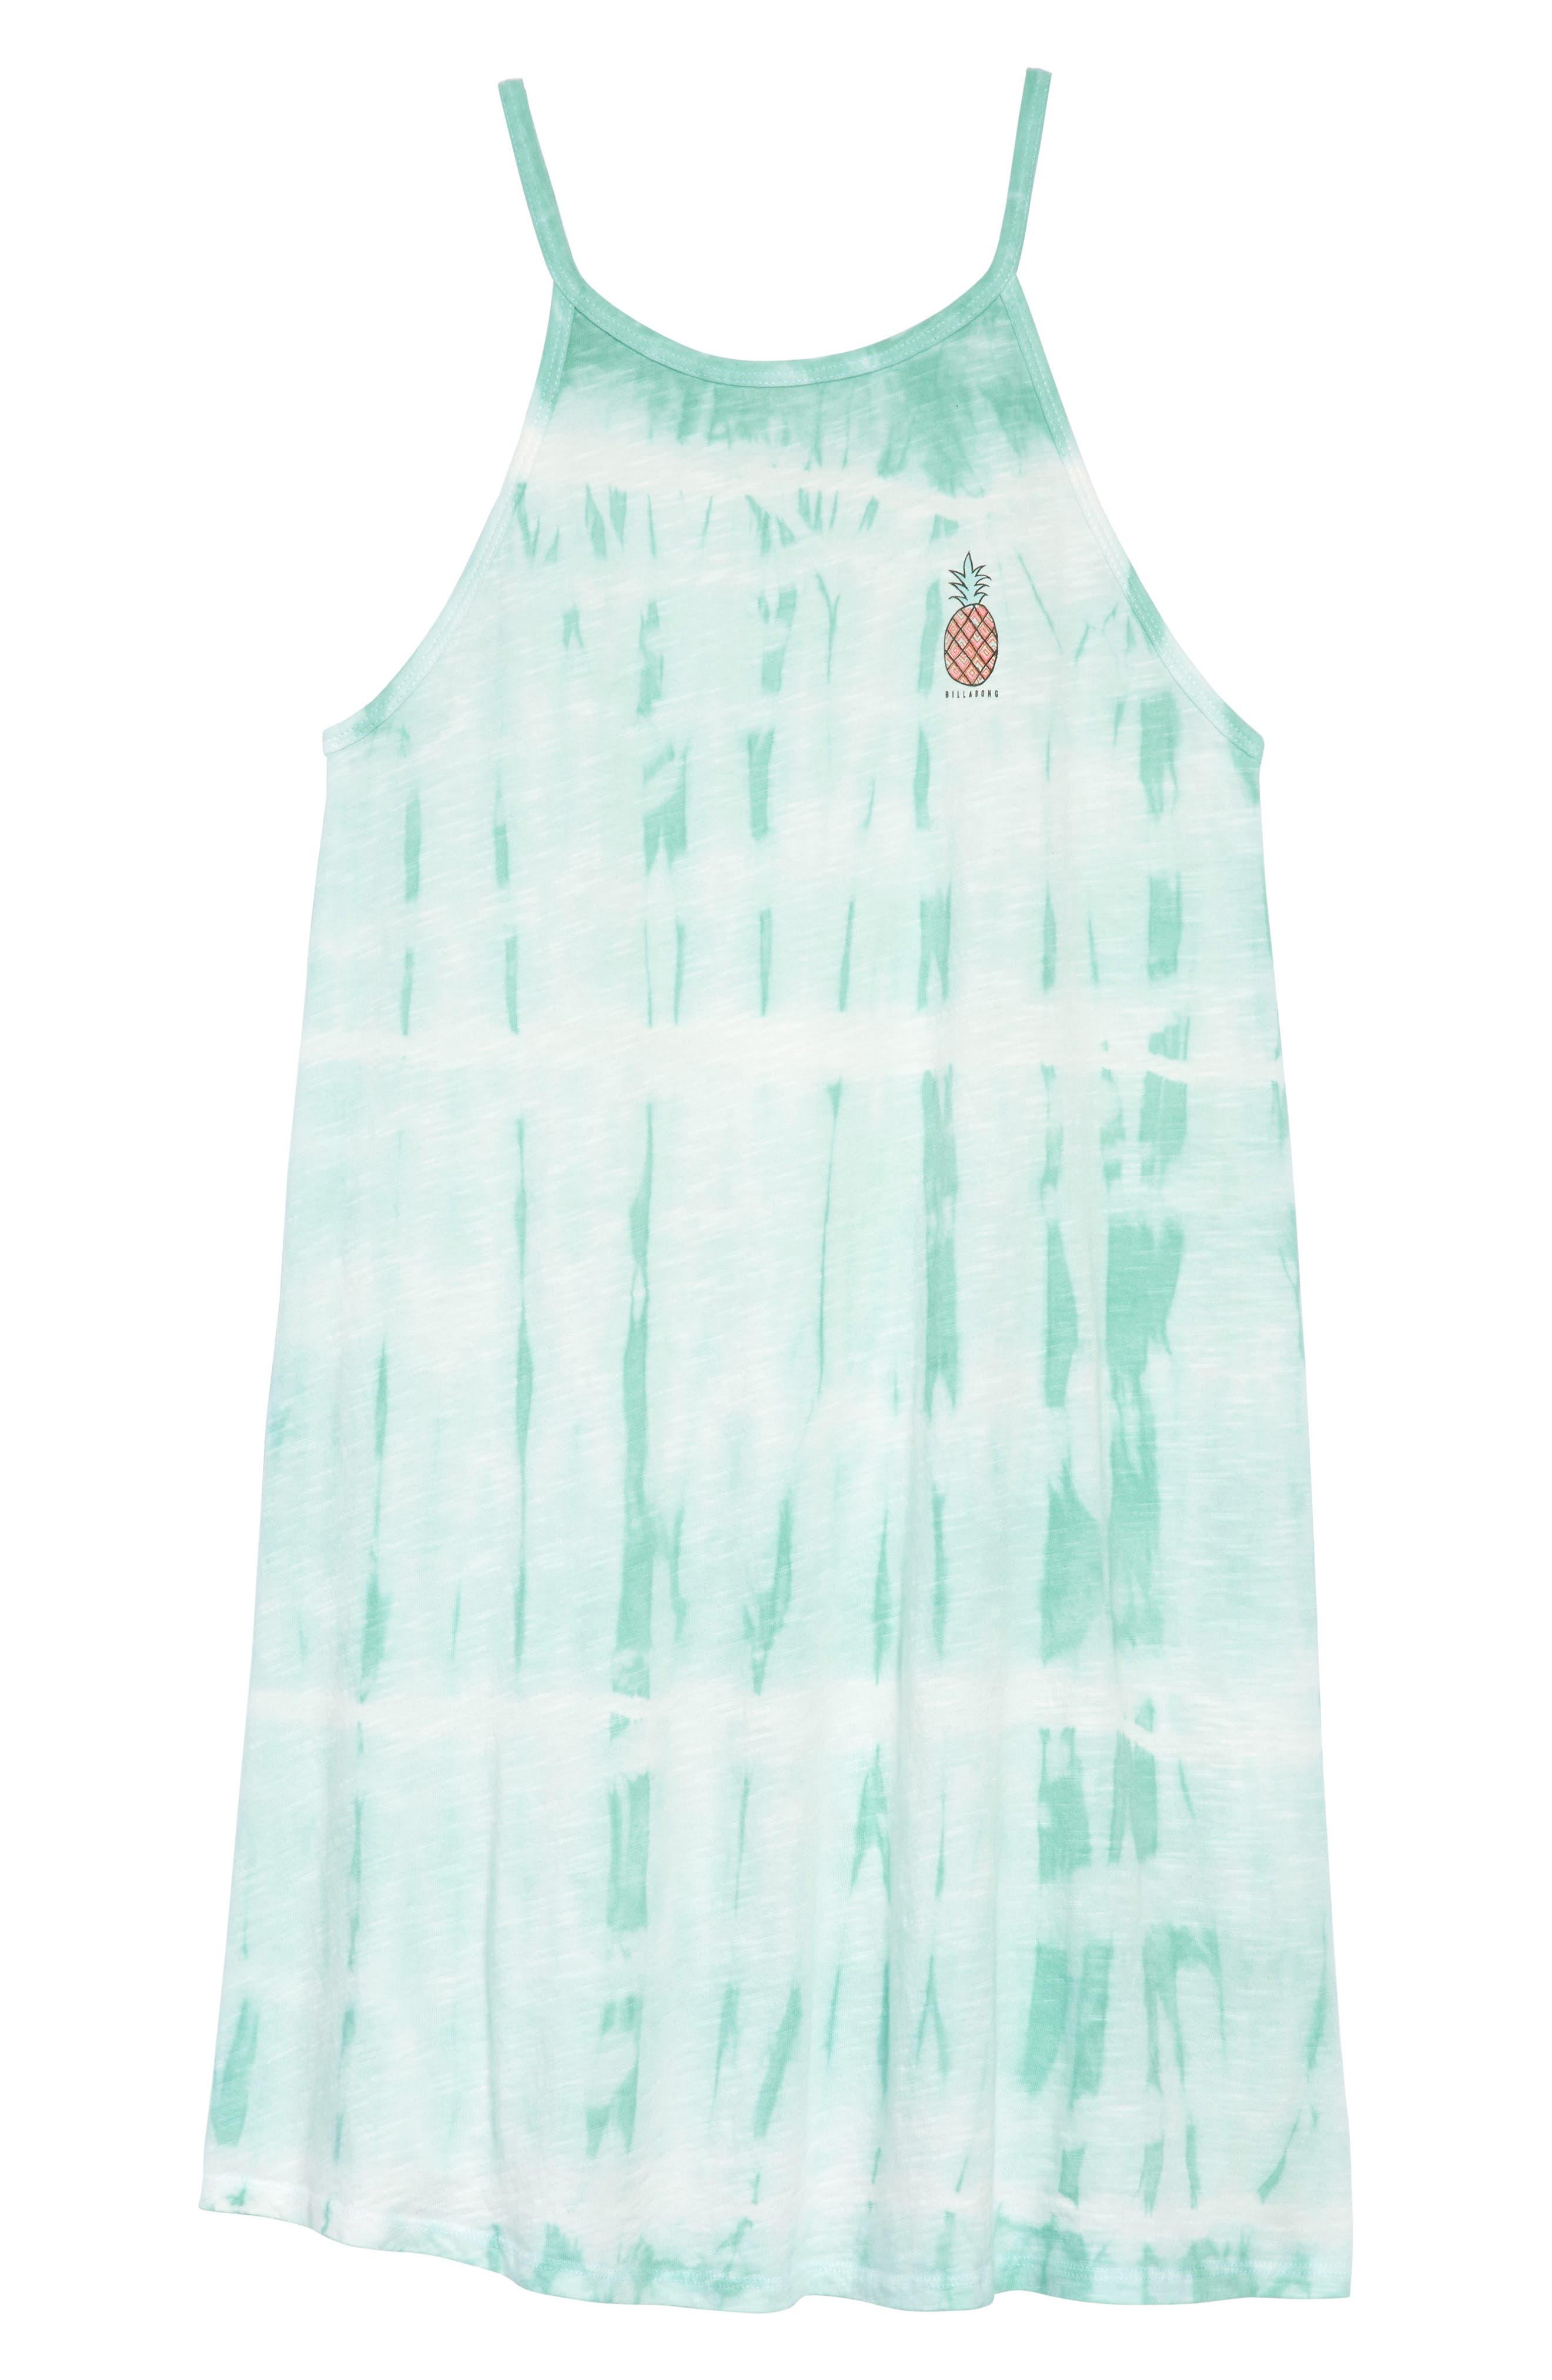 Namaste All Day Tie-Dye Dress,                         Main,                         color, Beach Glass